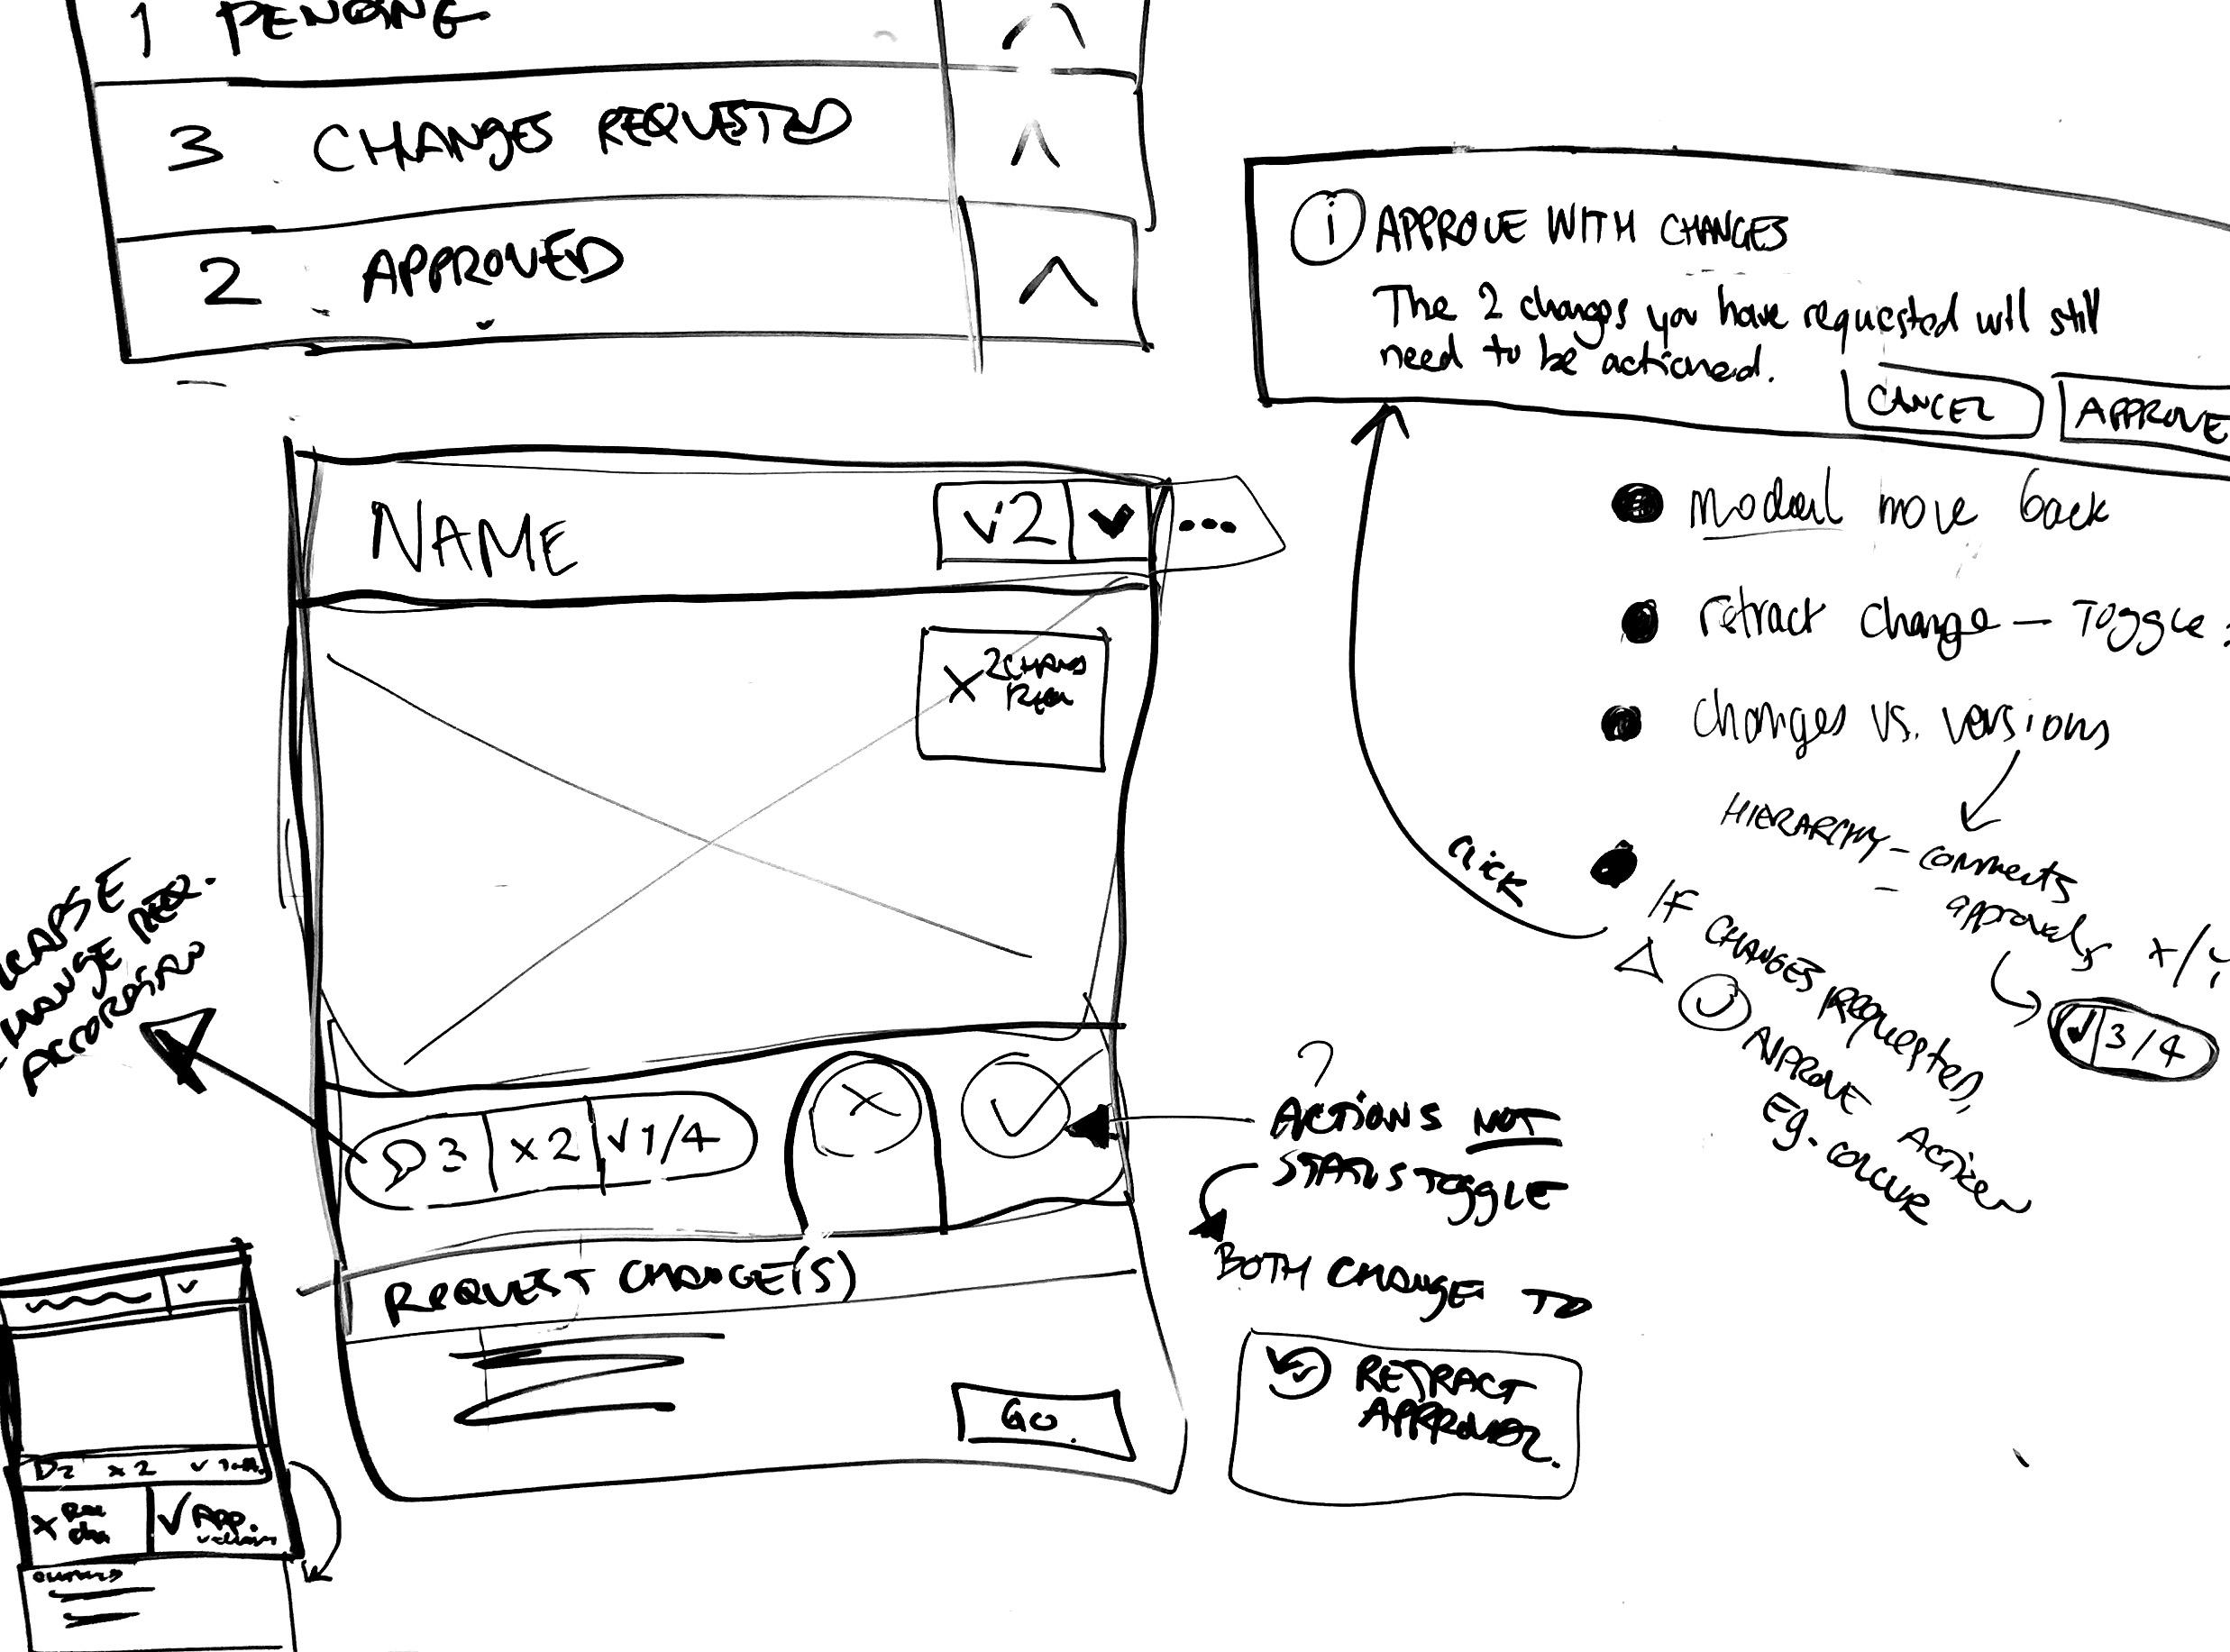 ux-design-structured-approvals-whiteboard.jpg